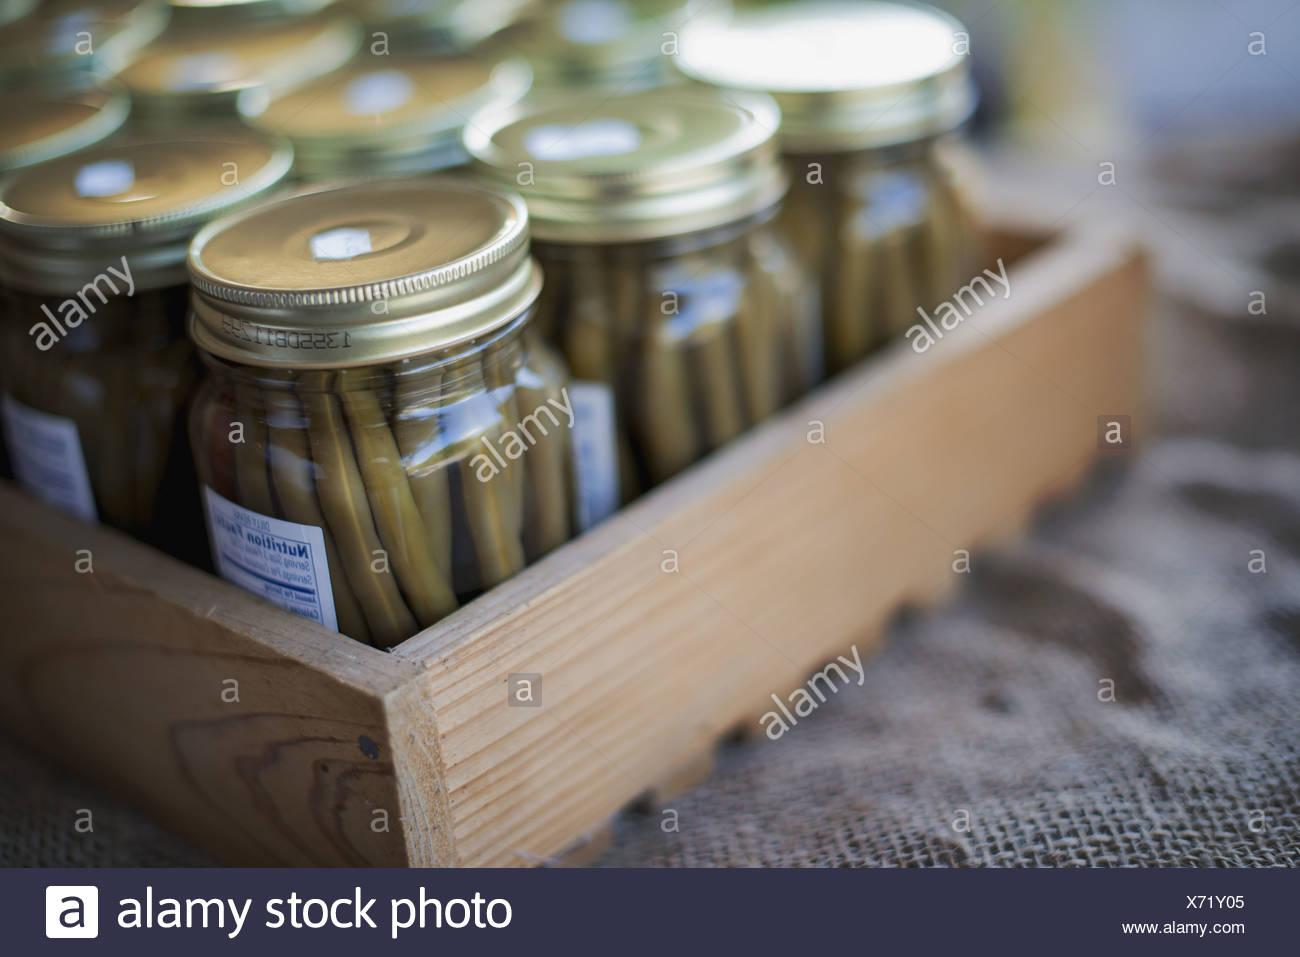 Woodstock New York USA Jars of Organic Green Beans - Stock Image